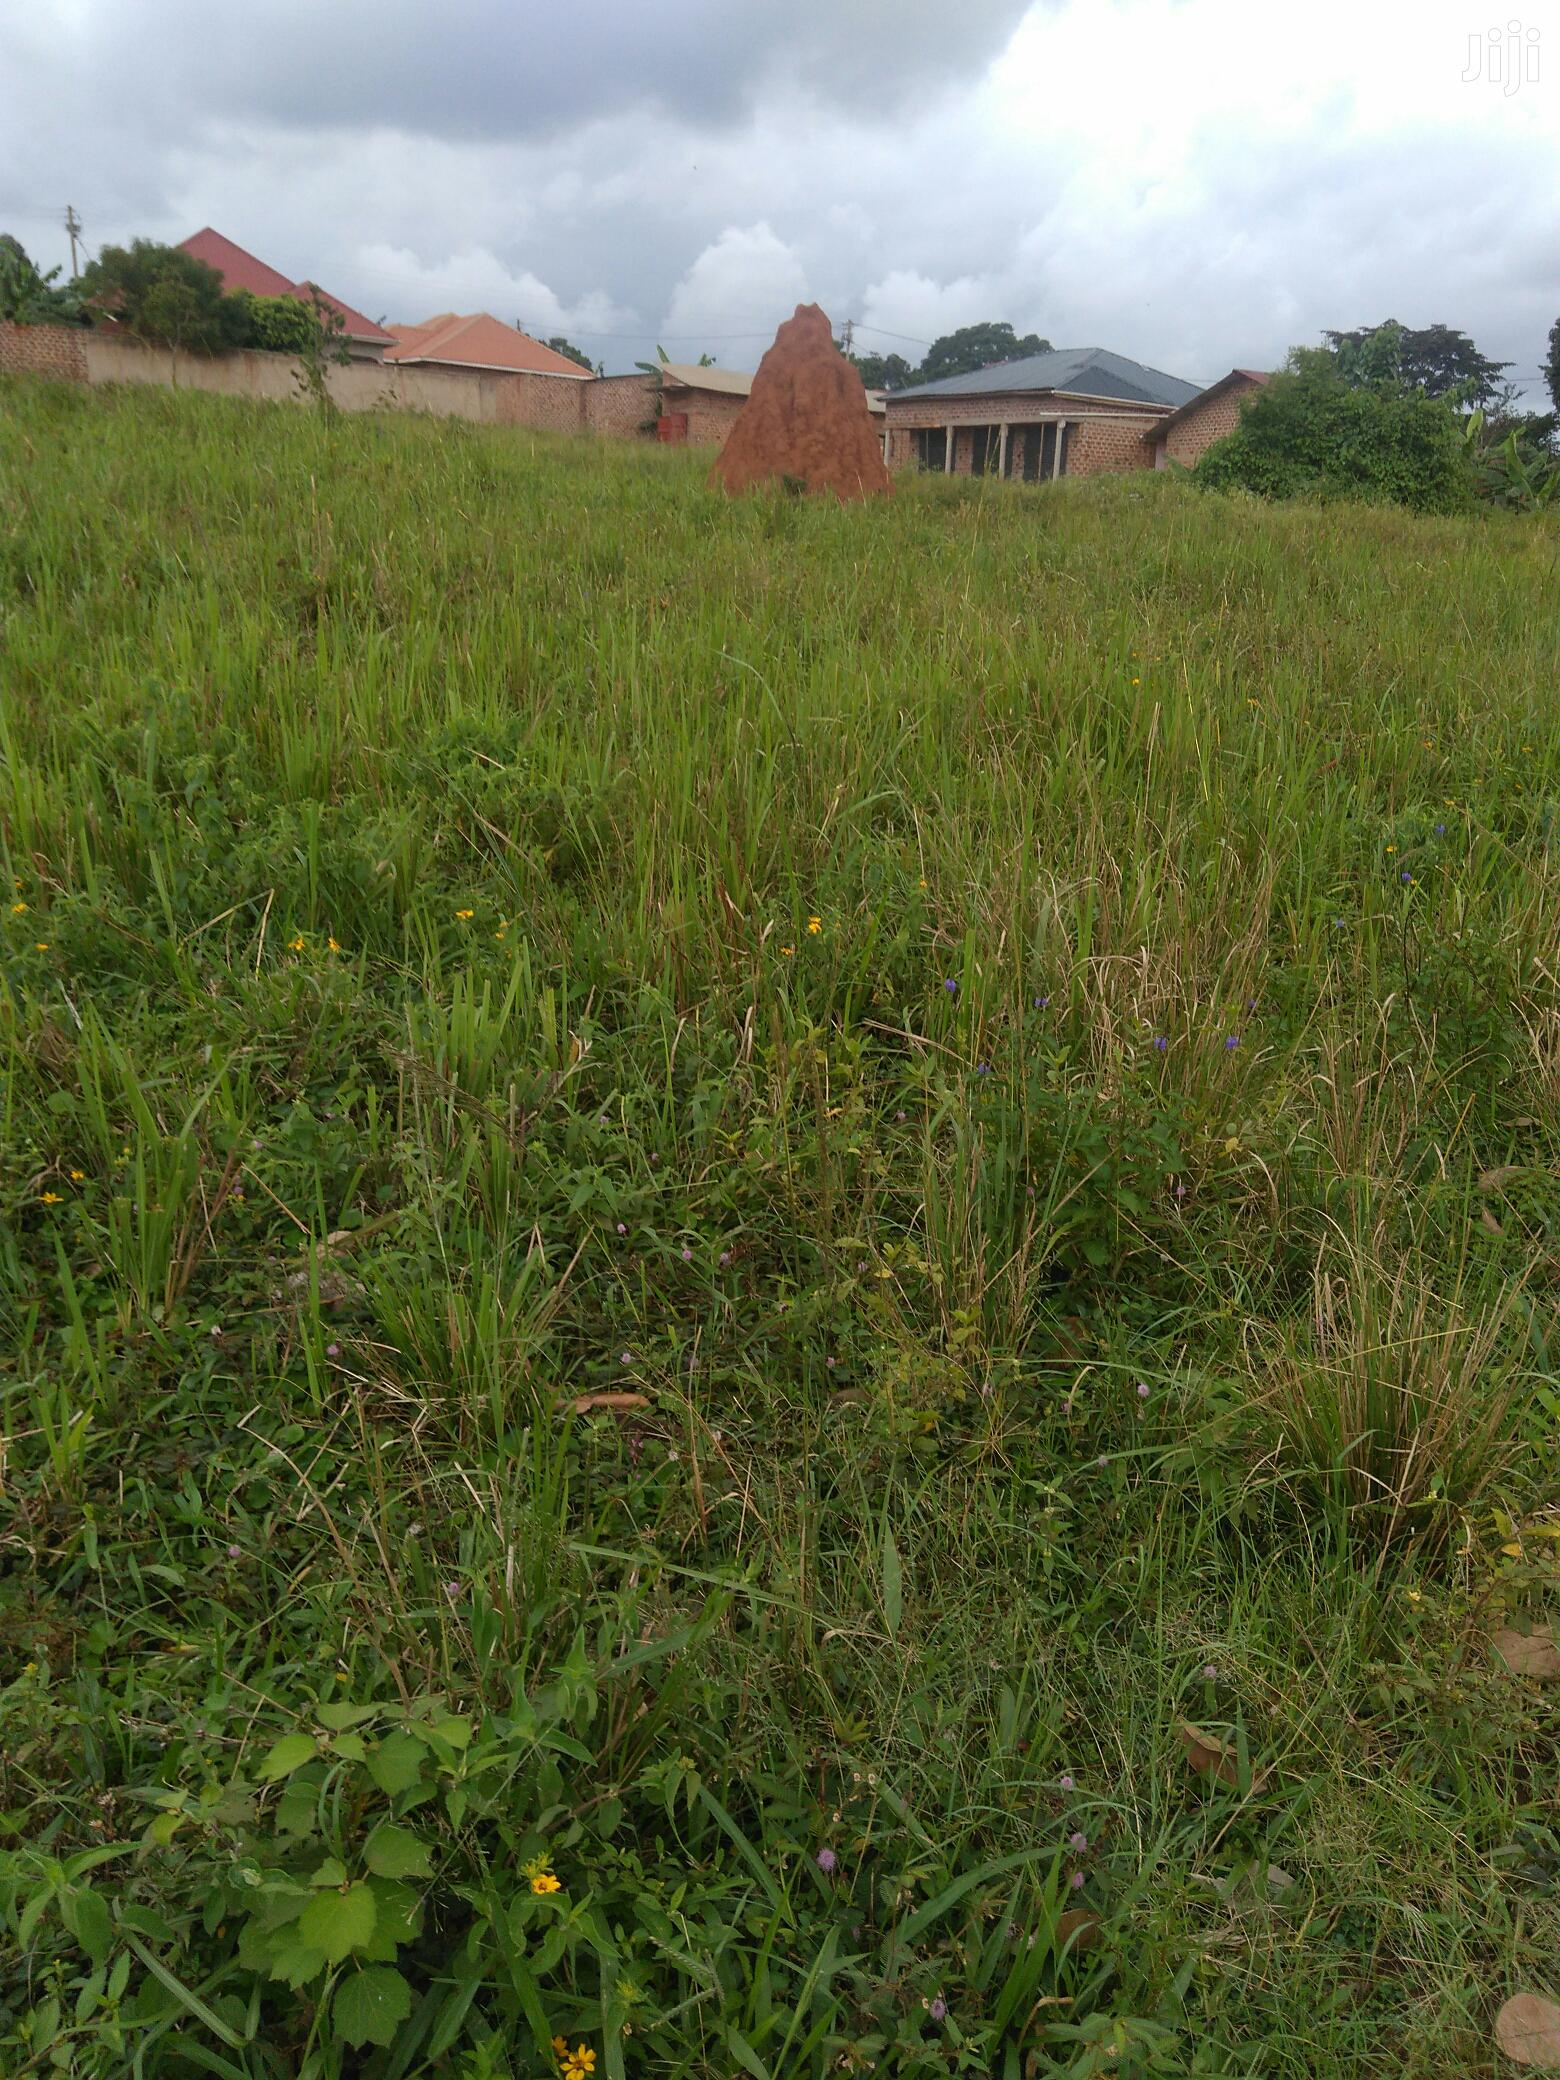 1 Acre Land In Gayaza Namavundu For Sale